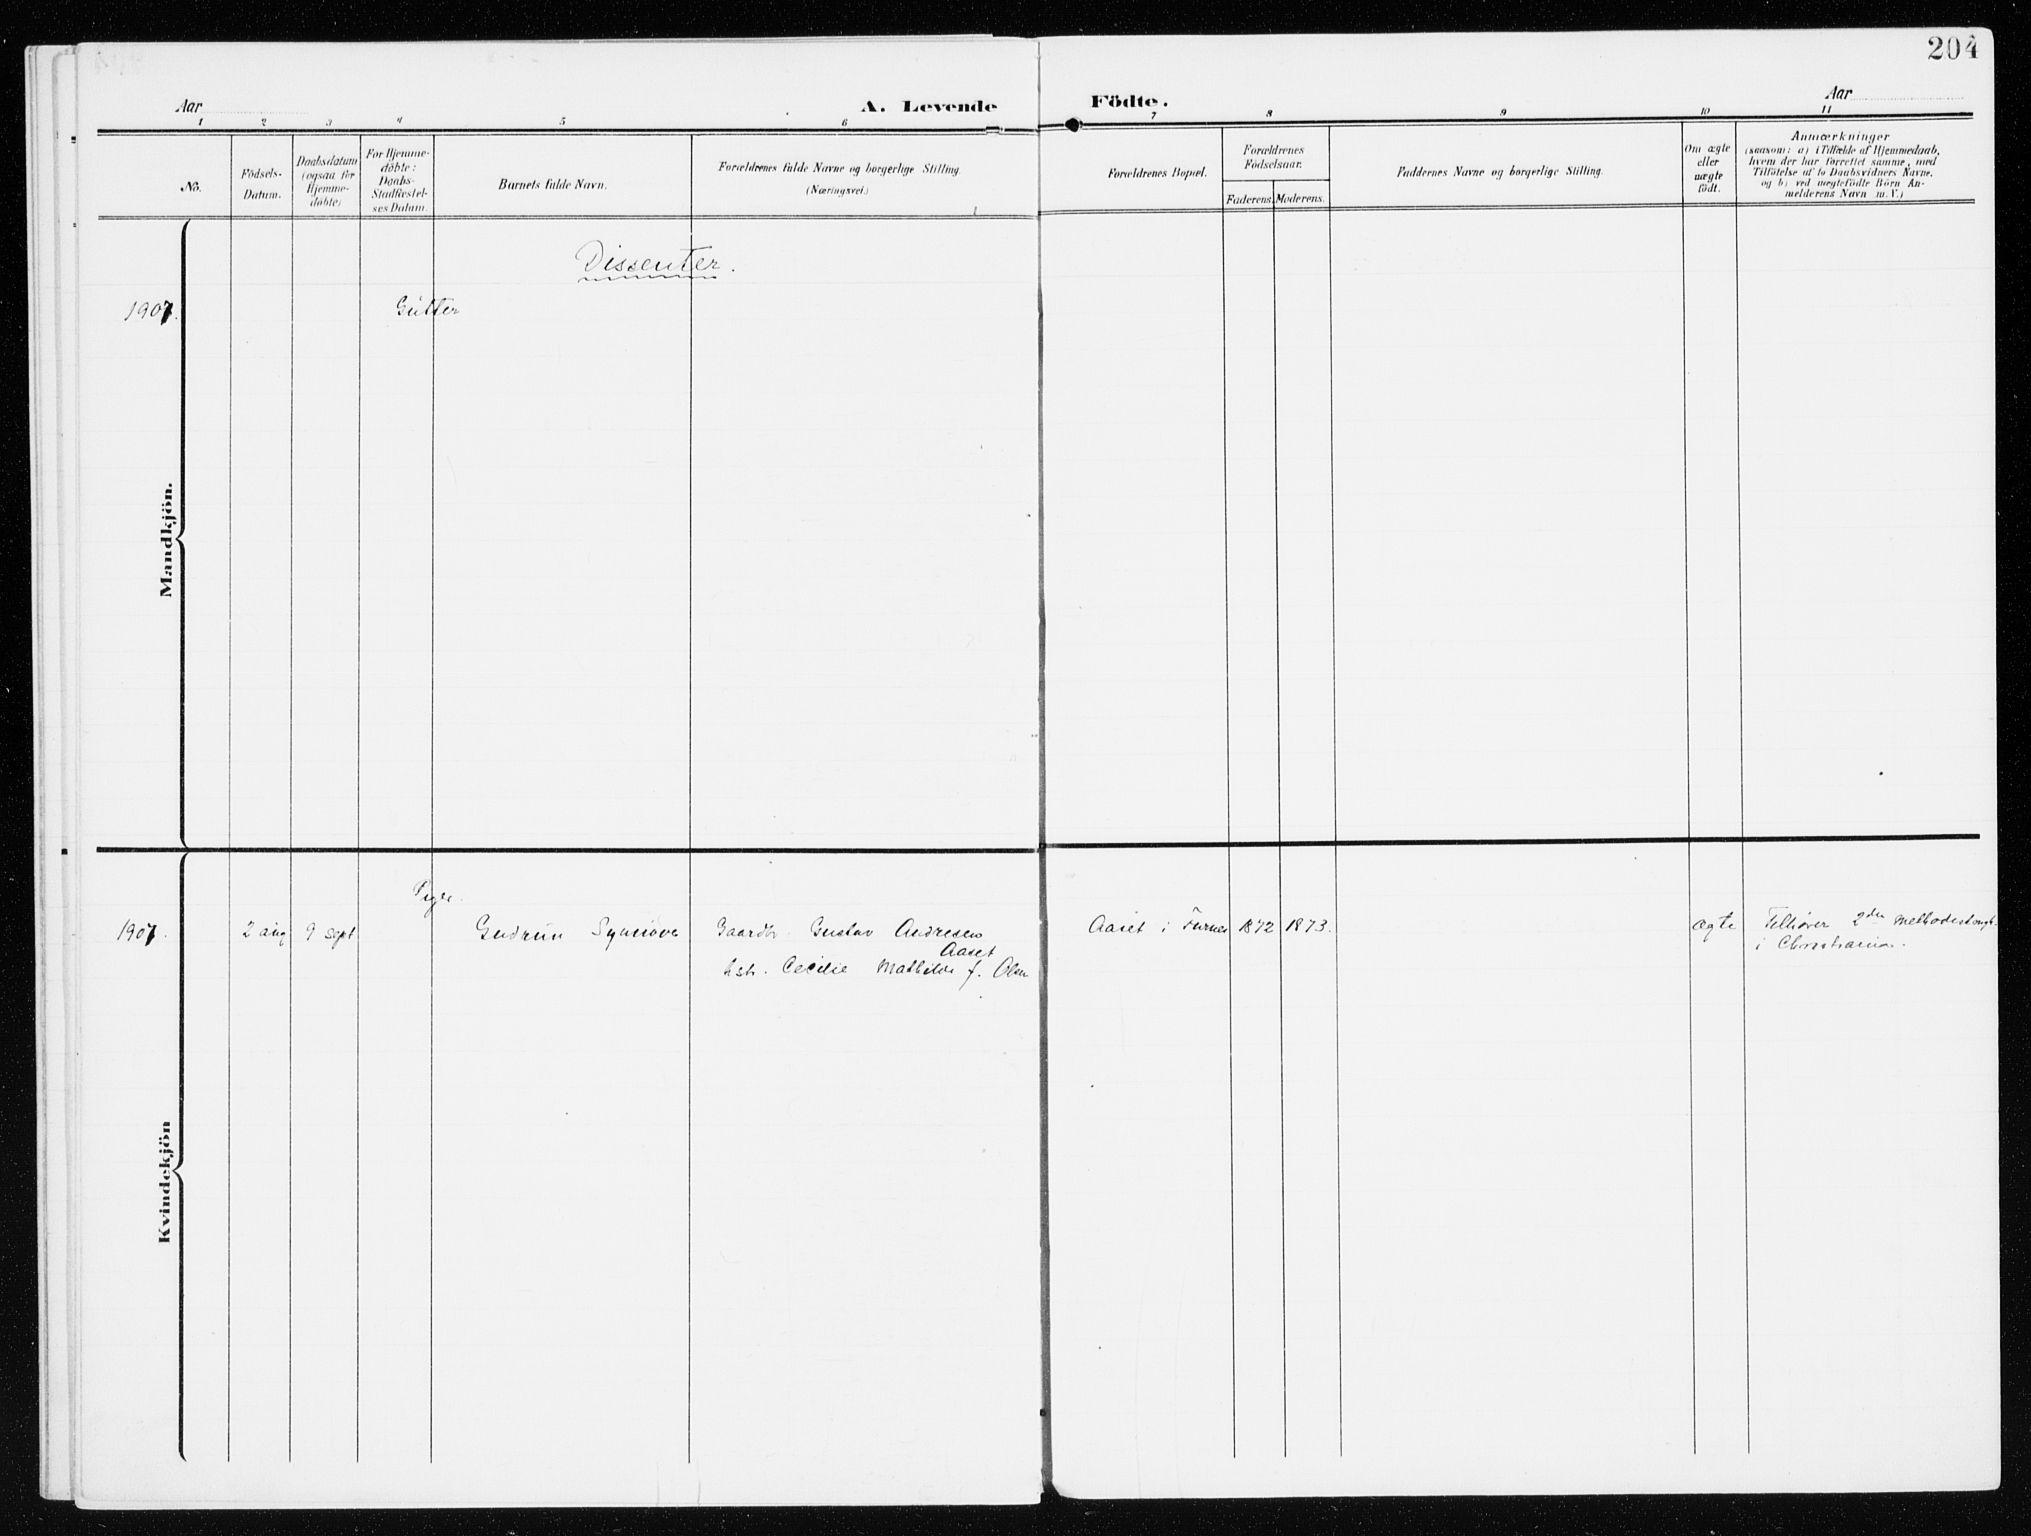 SAH, Furnes prestekontor, K/Ka/L0001: Ministerialbok nr. 1, 1907-1935, s. 204